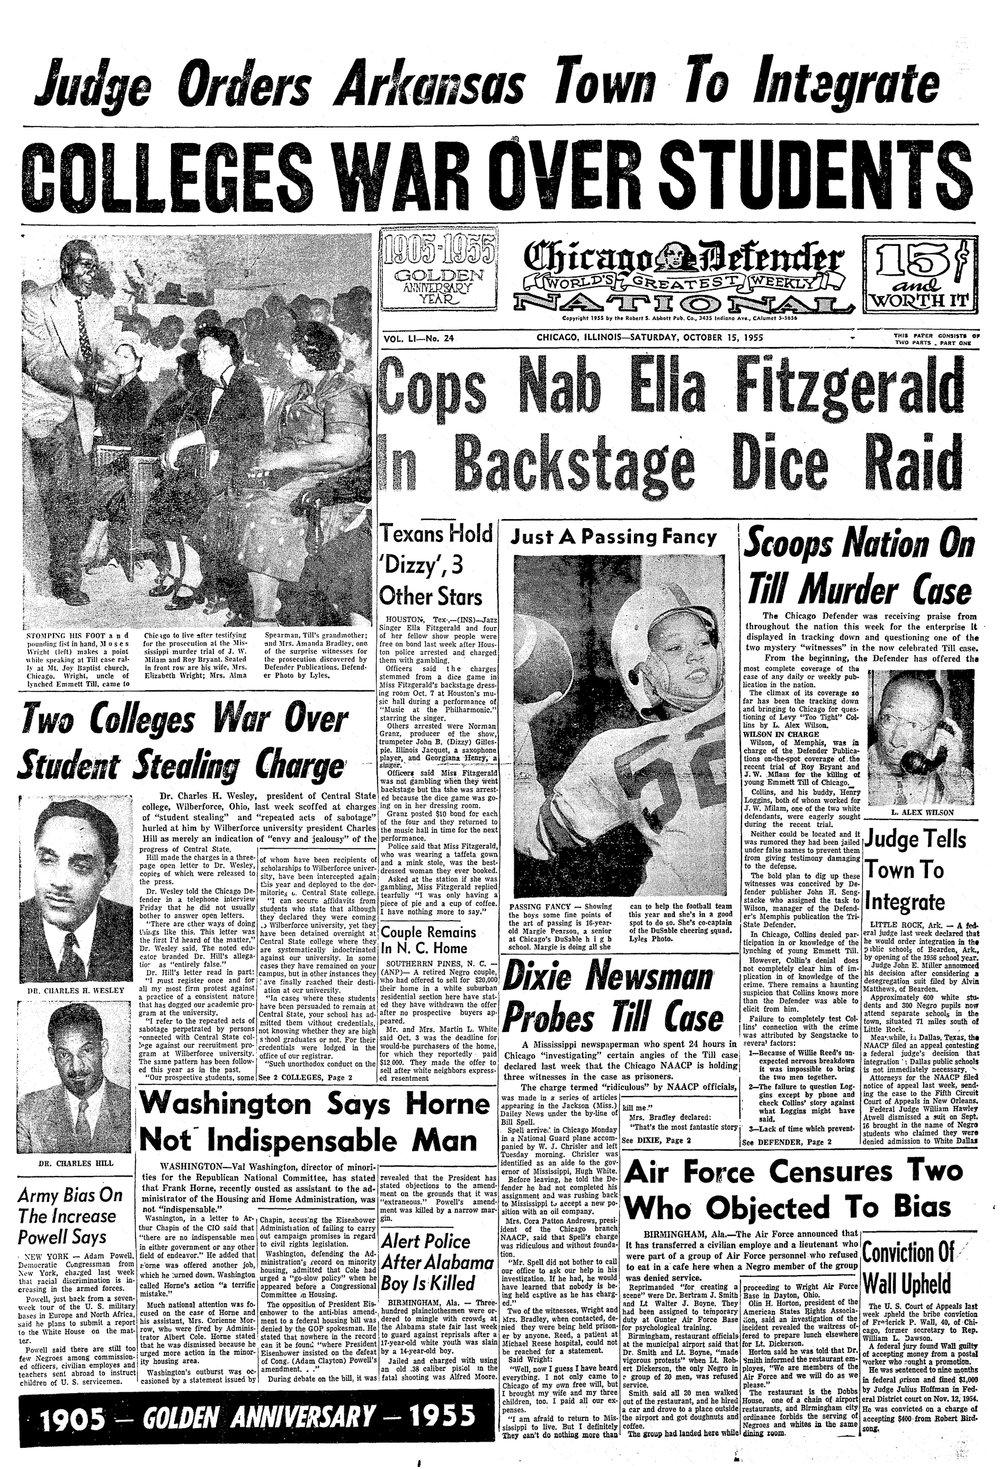 10.15.1955